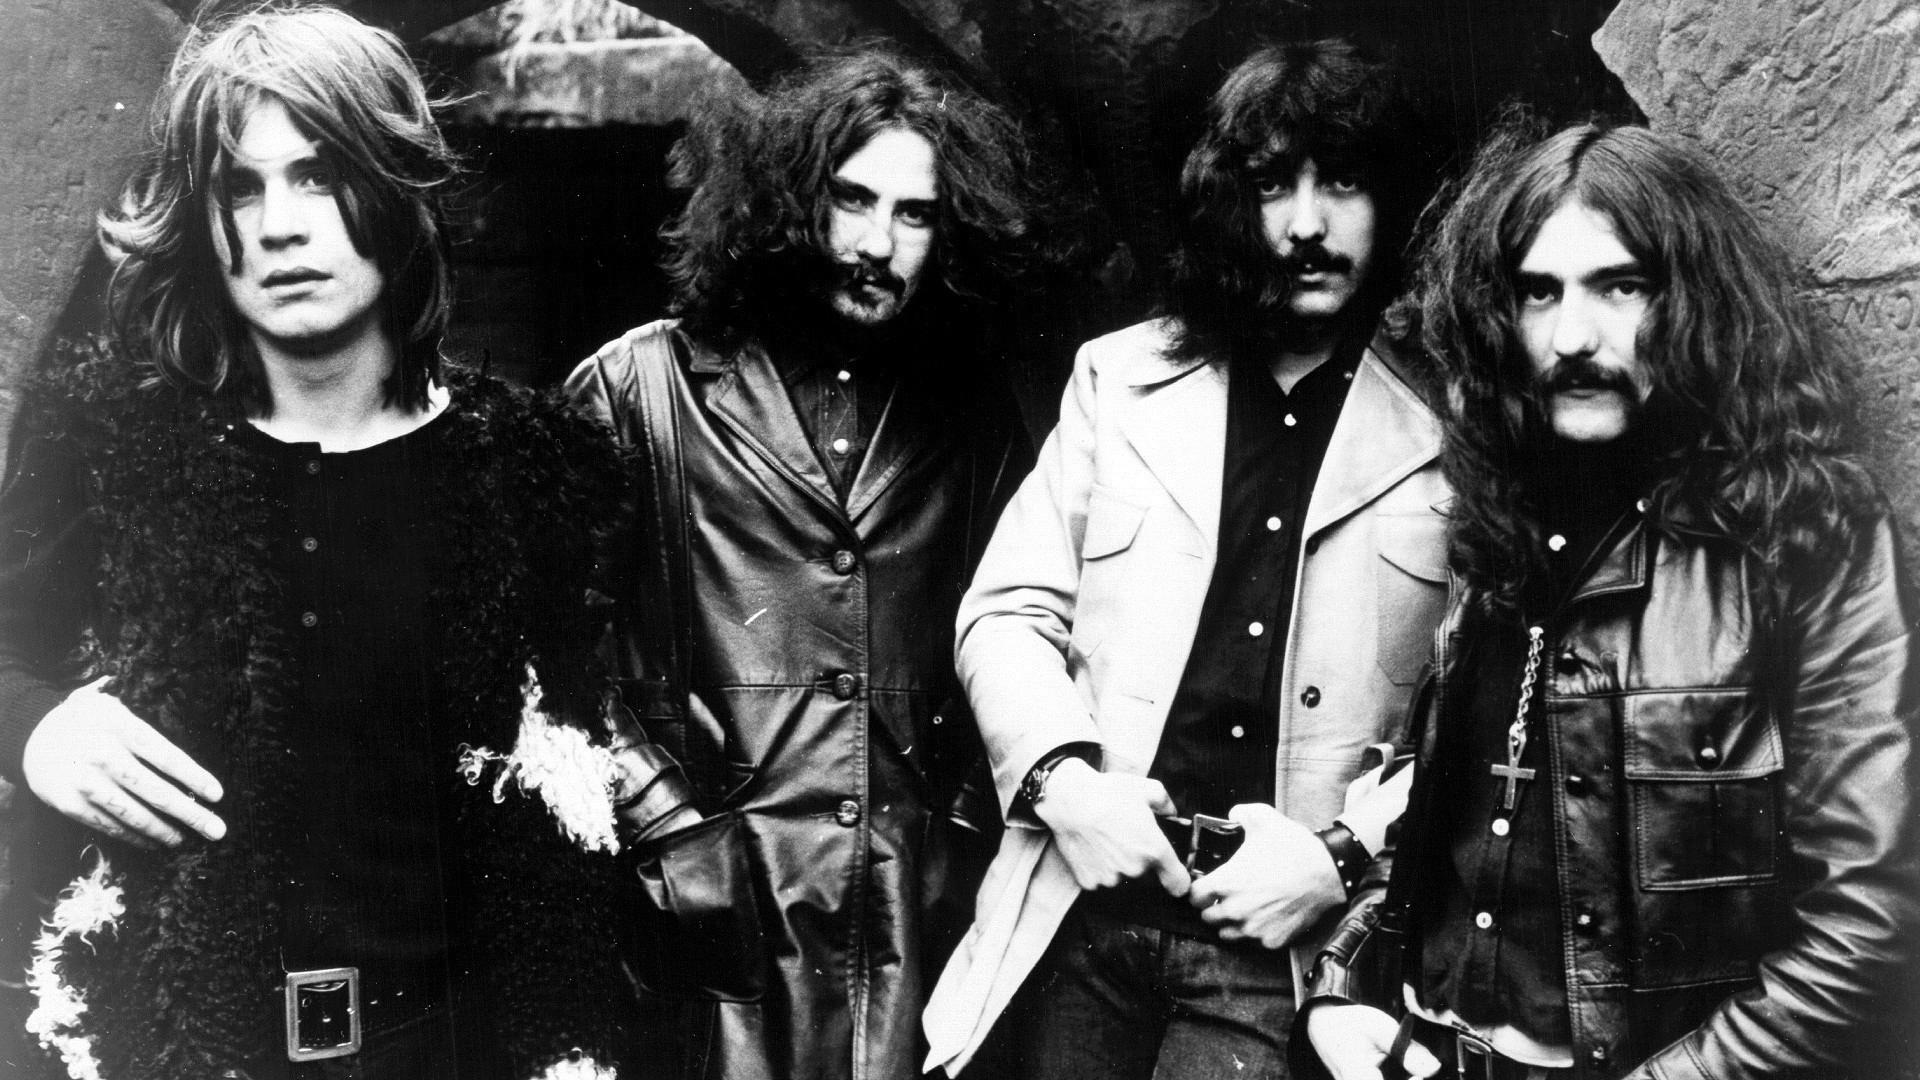 Wallpaper : 1920x1080 px, Black Sabbath ...